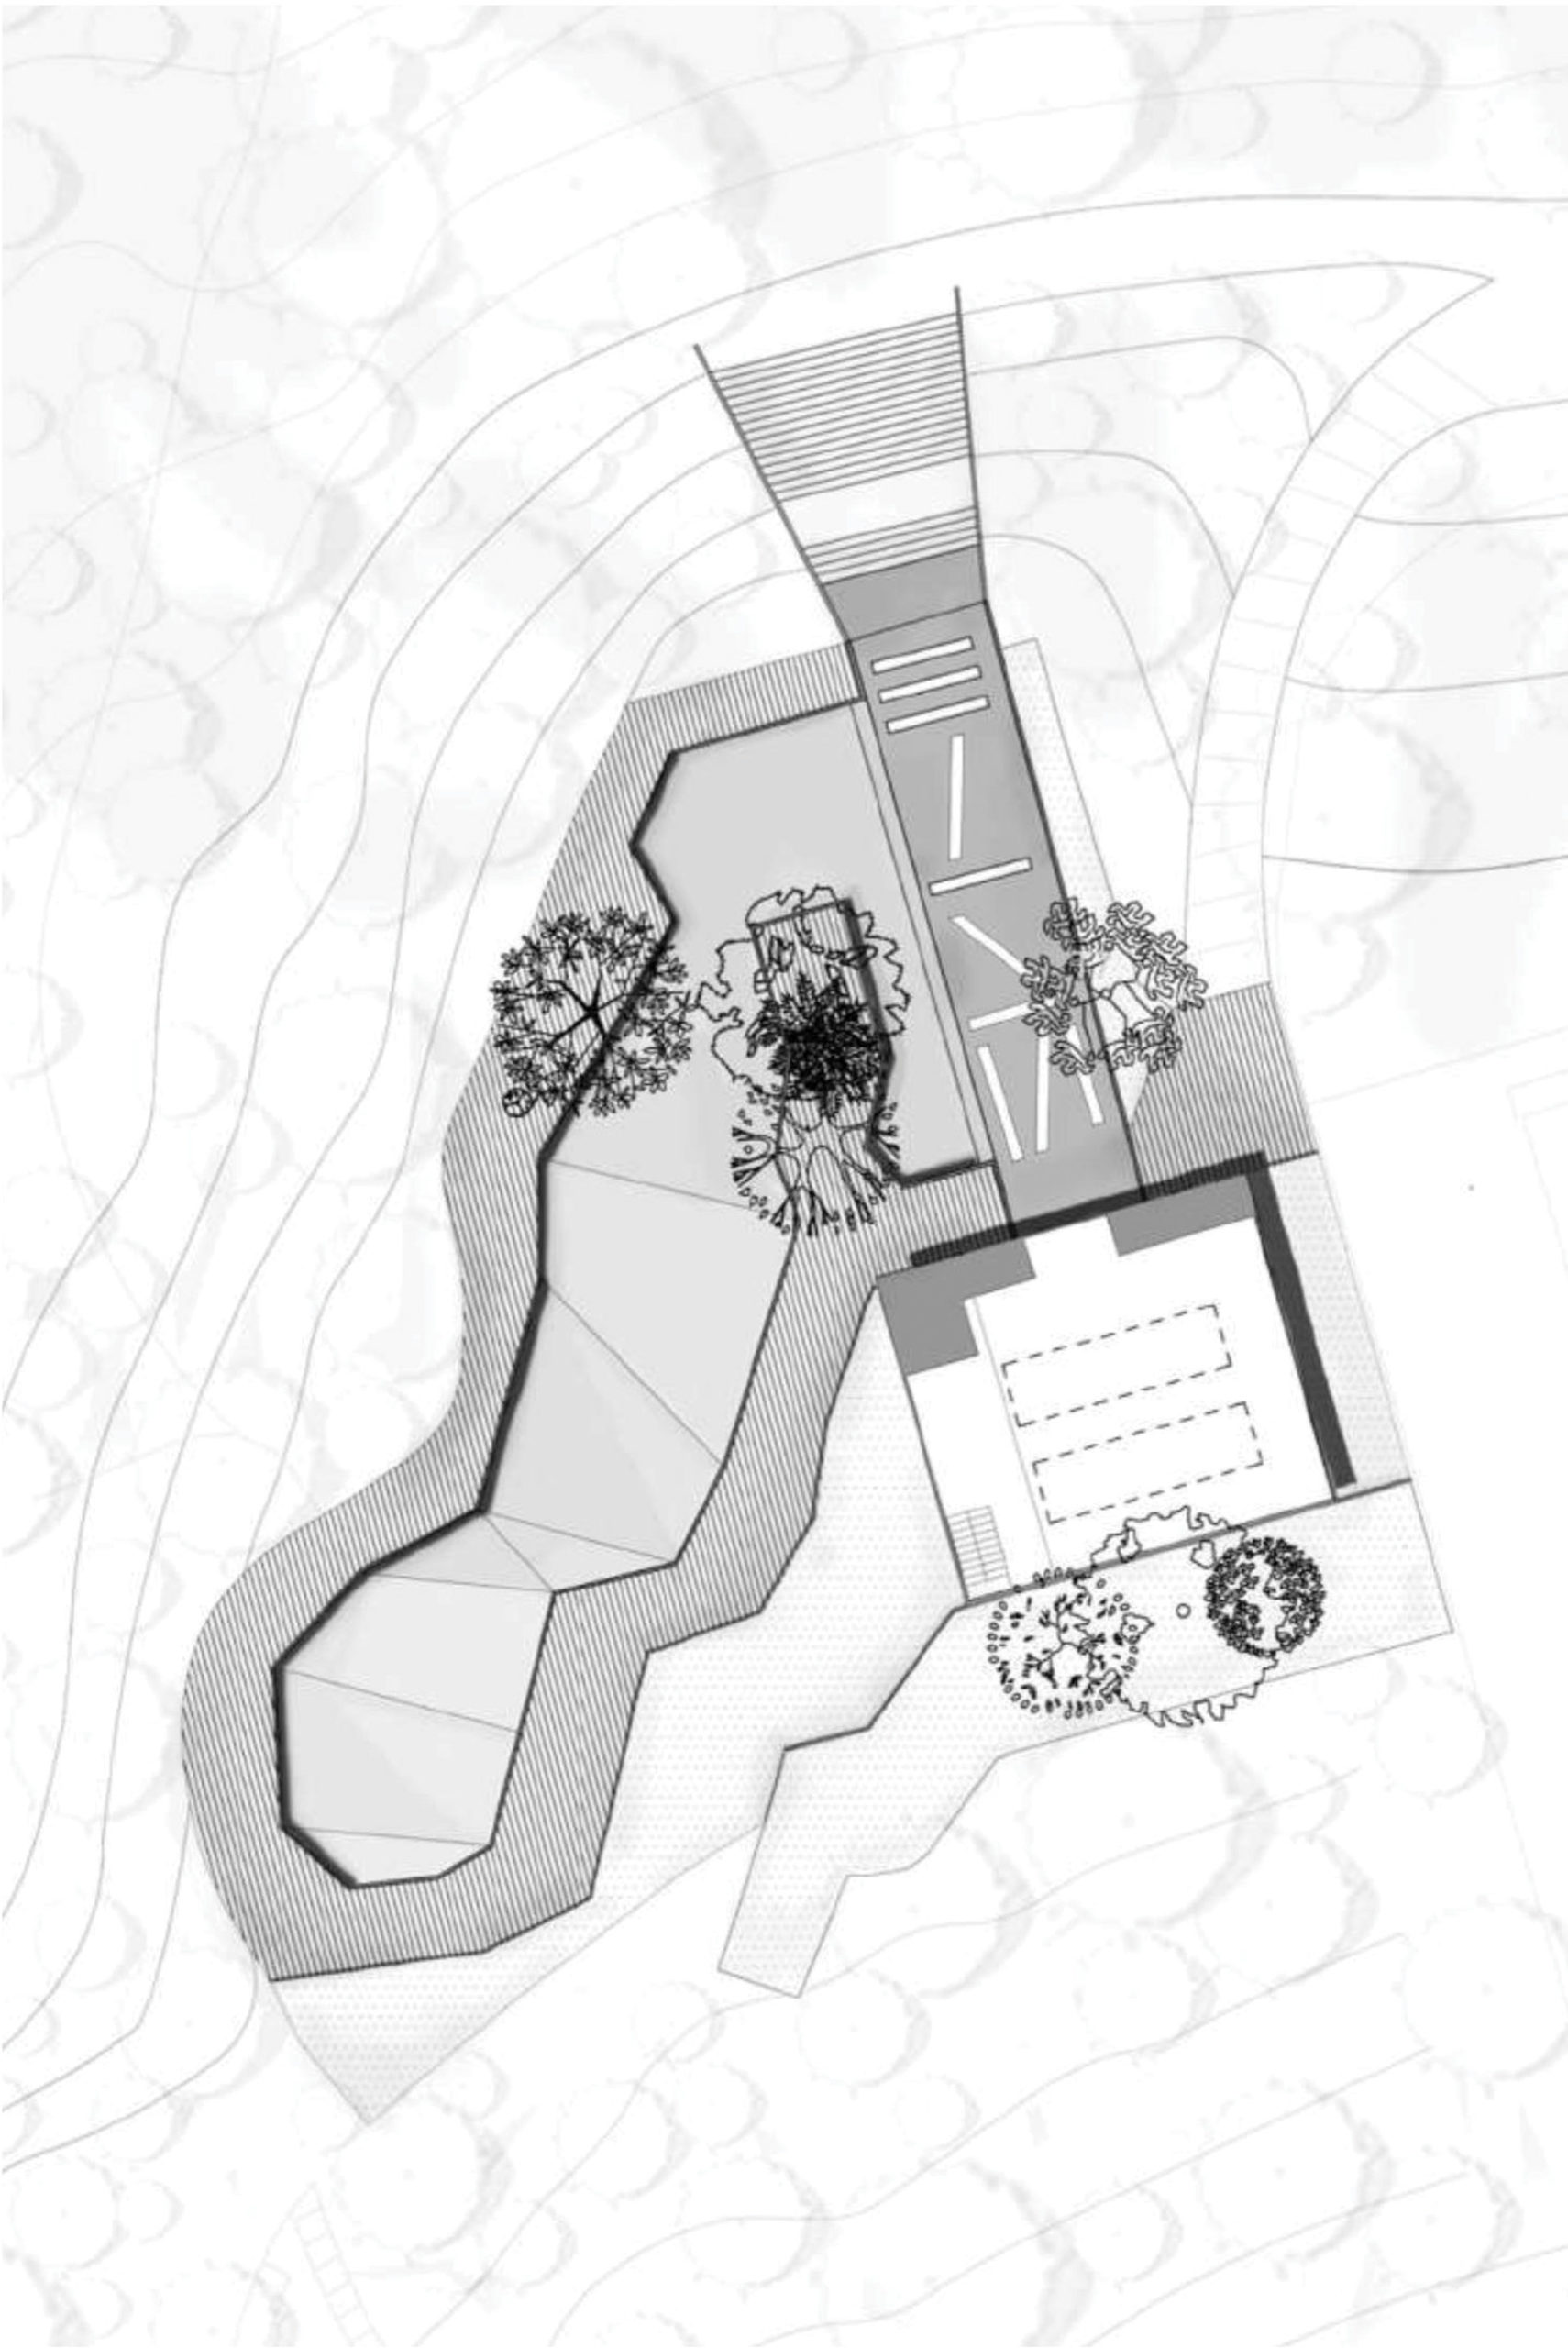 Enlarge Photo: Plan. By WONG Hoi Lam.